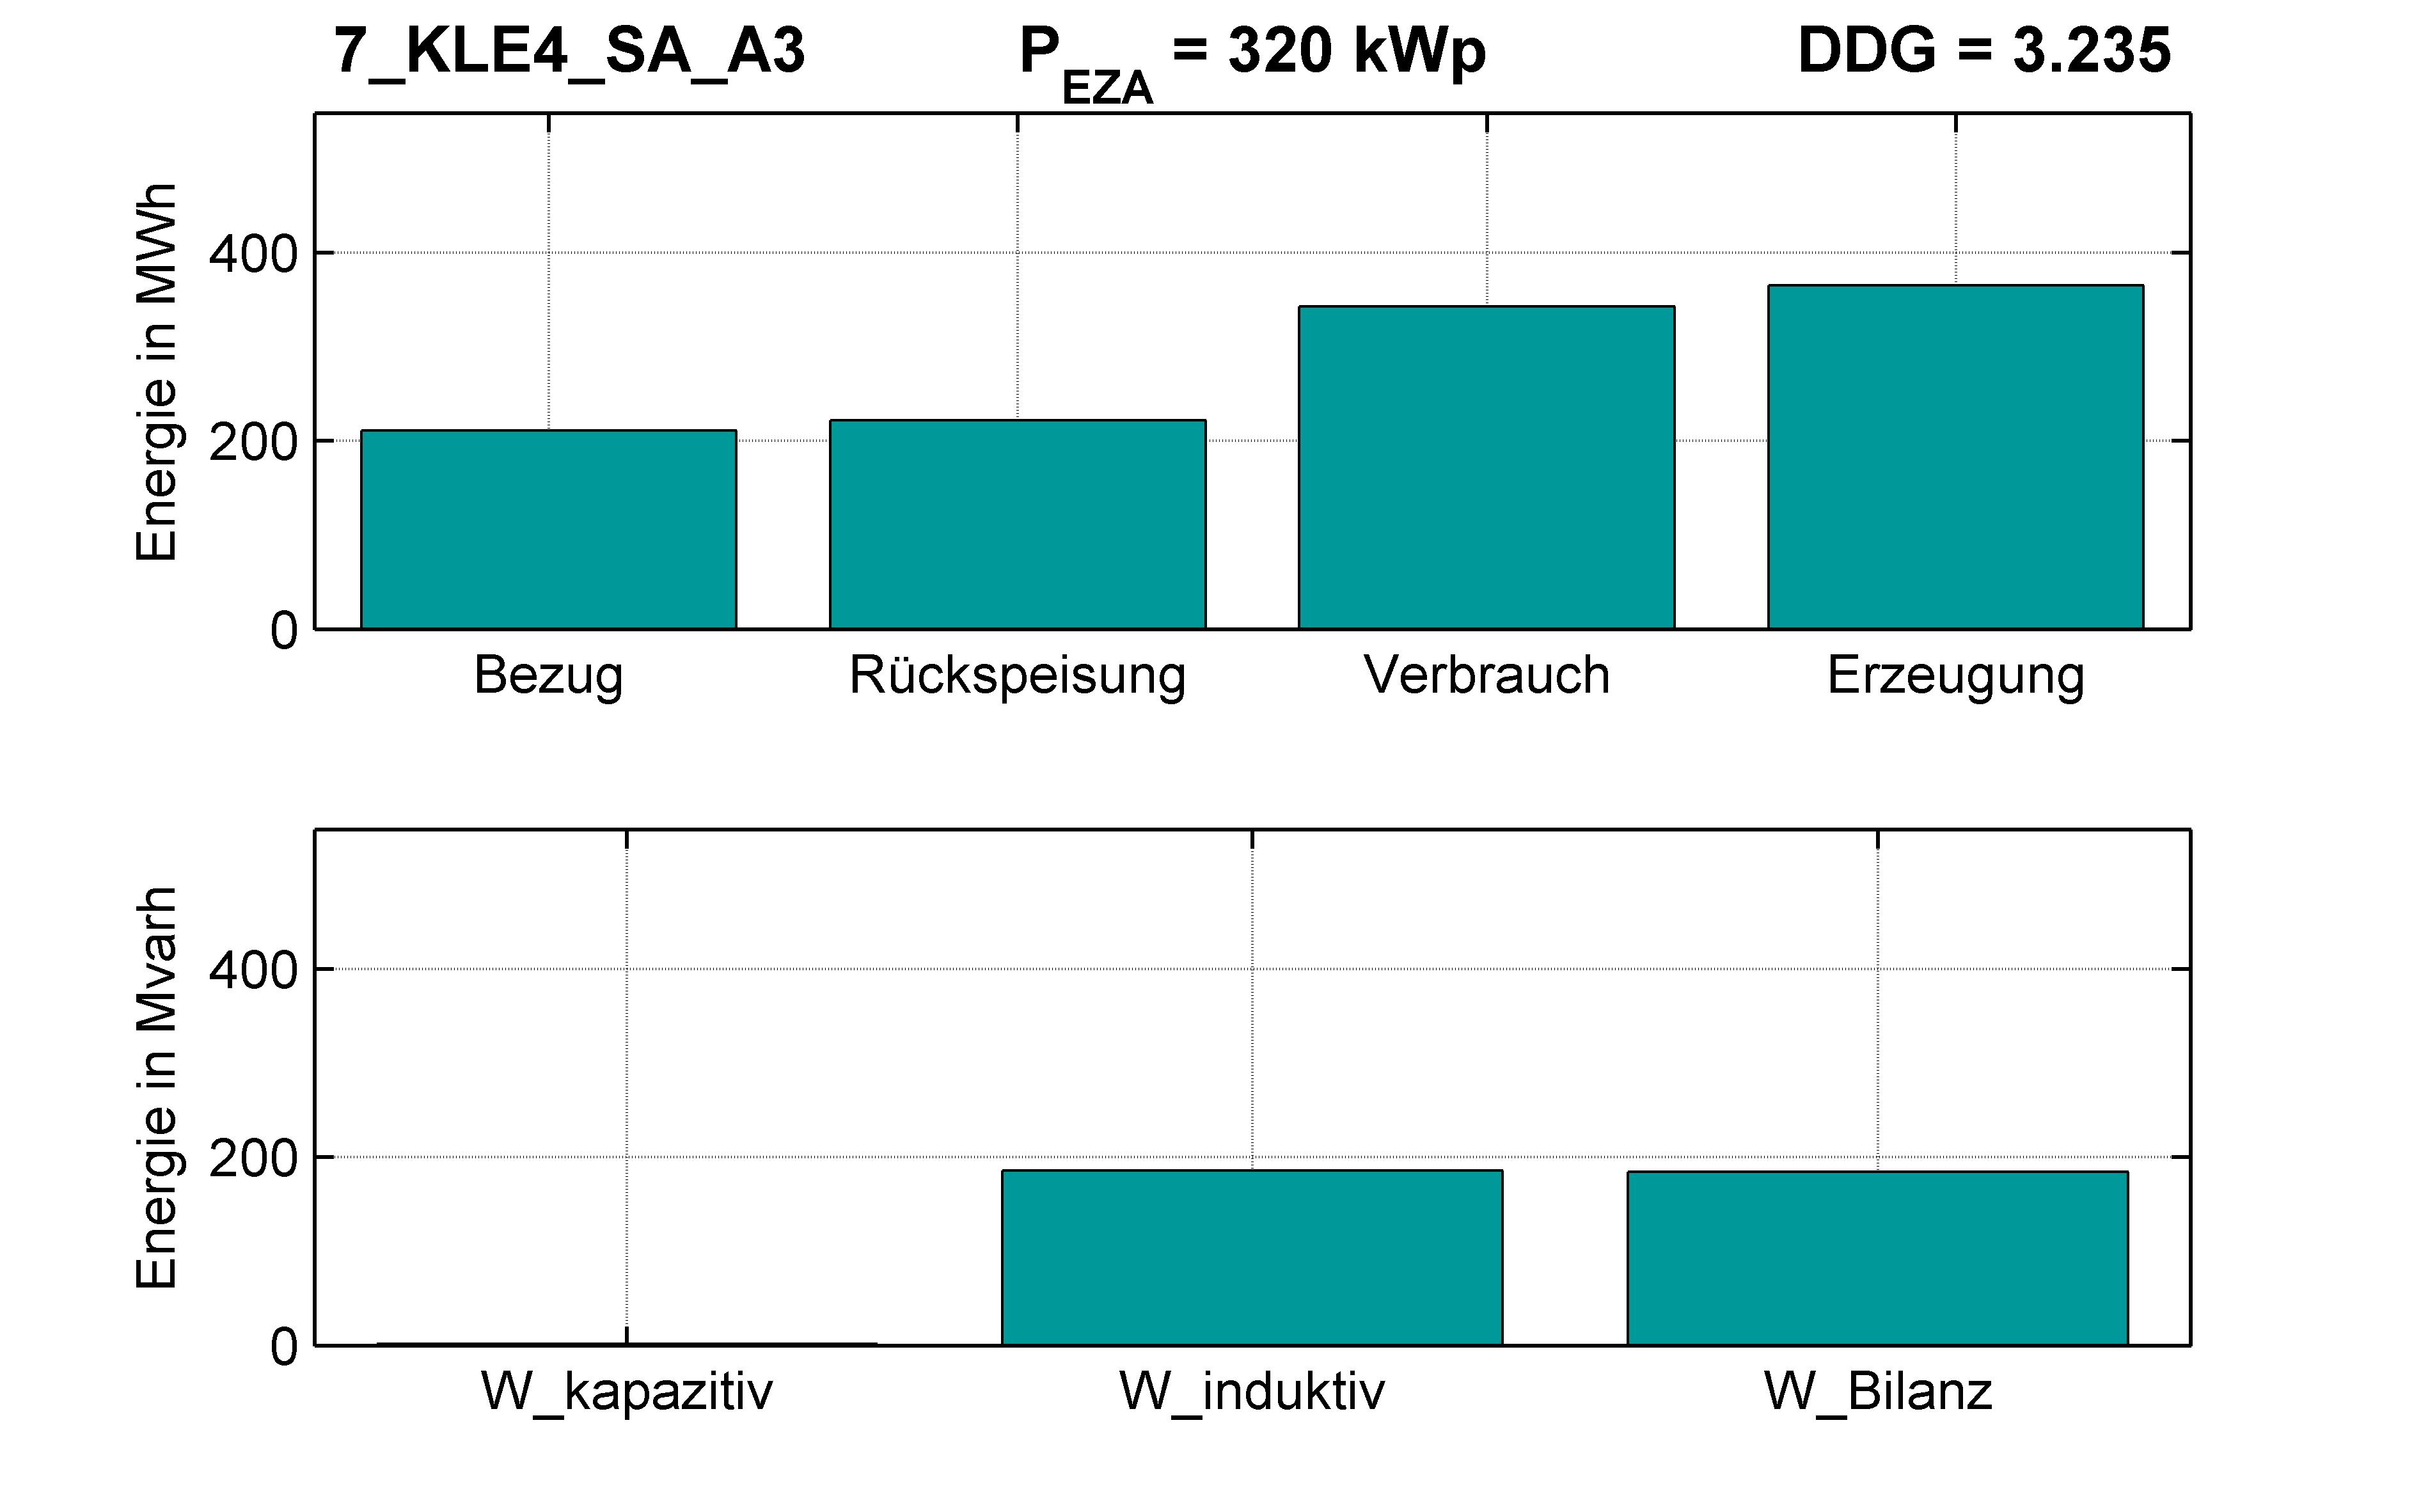 KLE4 | Längsregler (SA) A3 | PQ-Bilanz